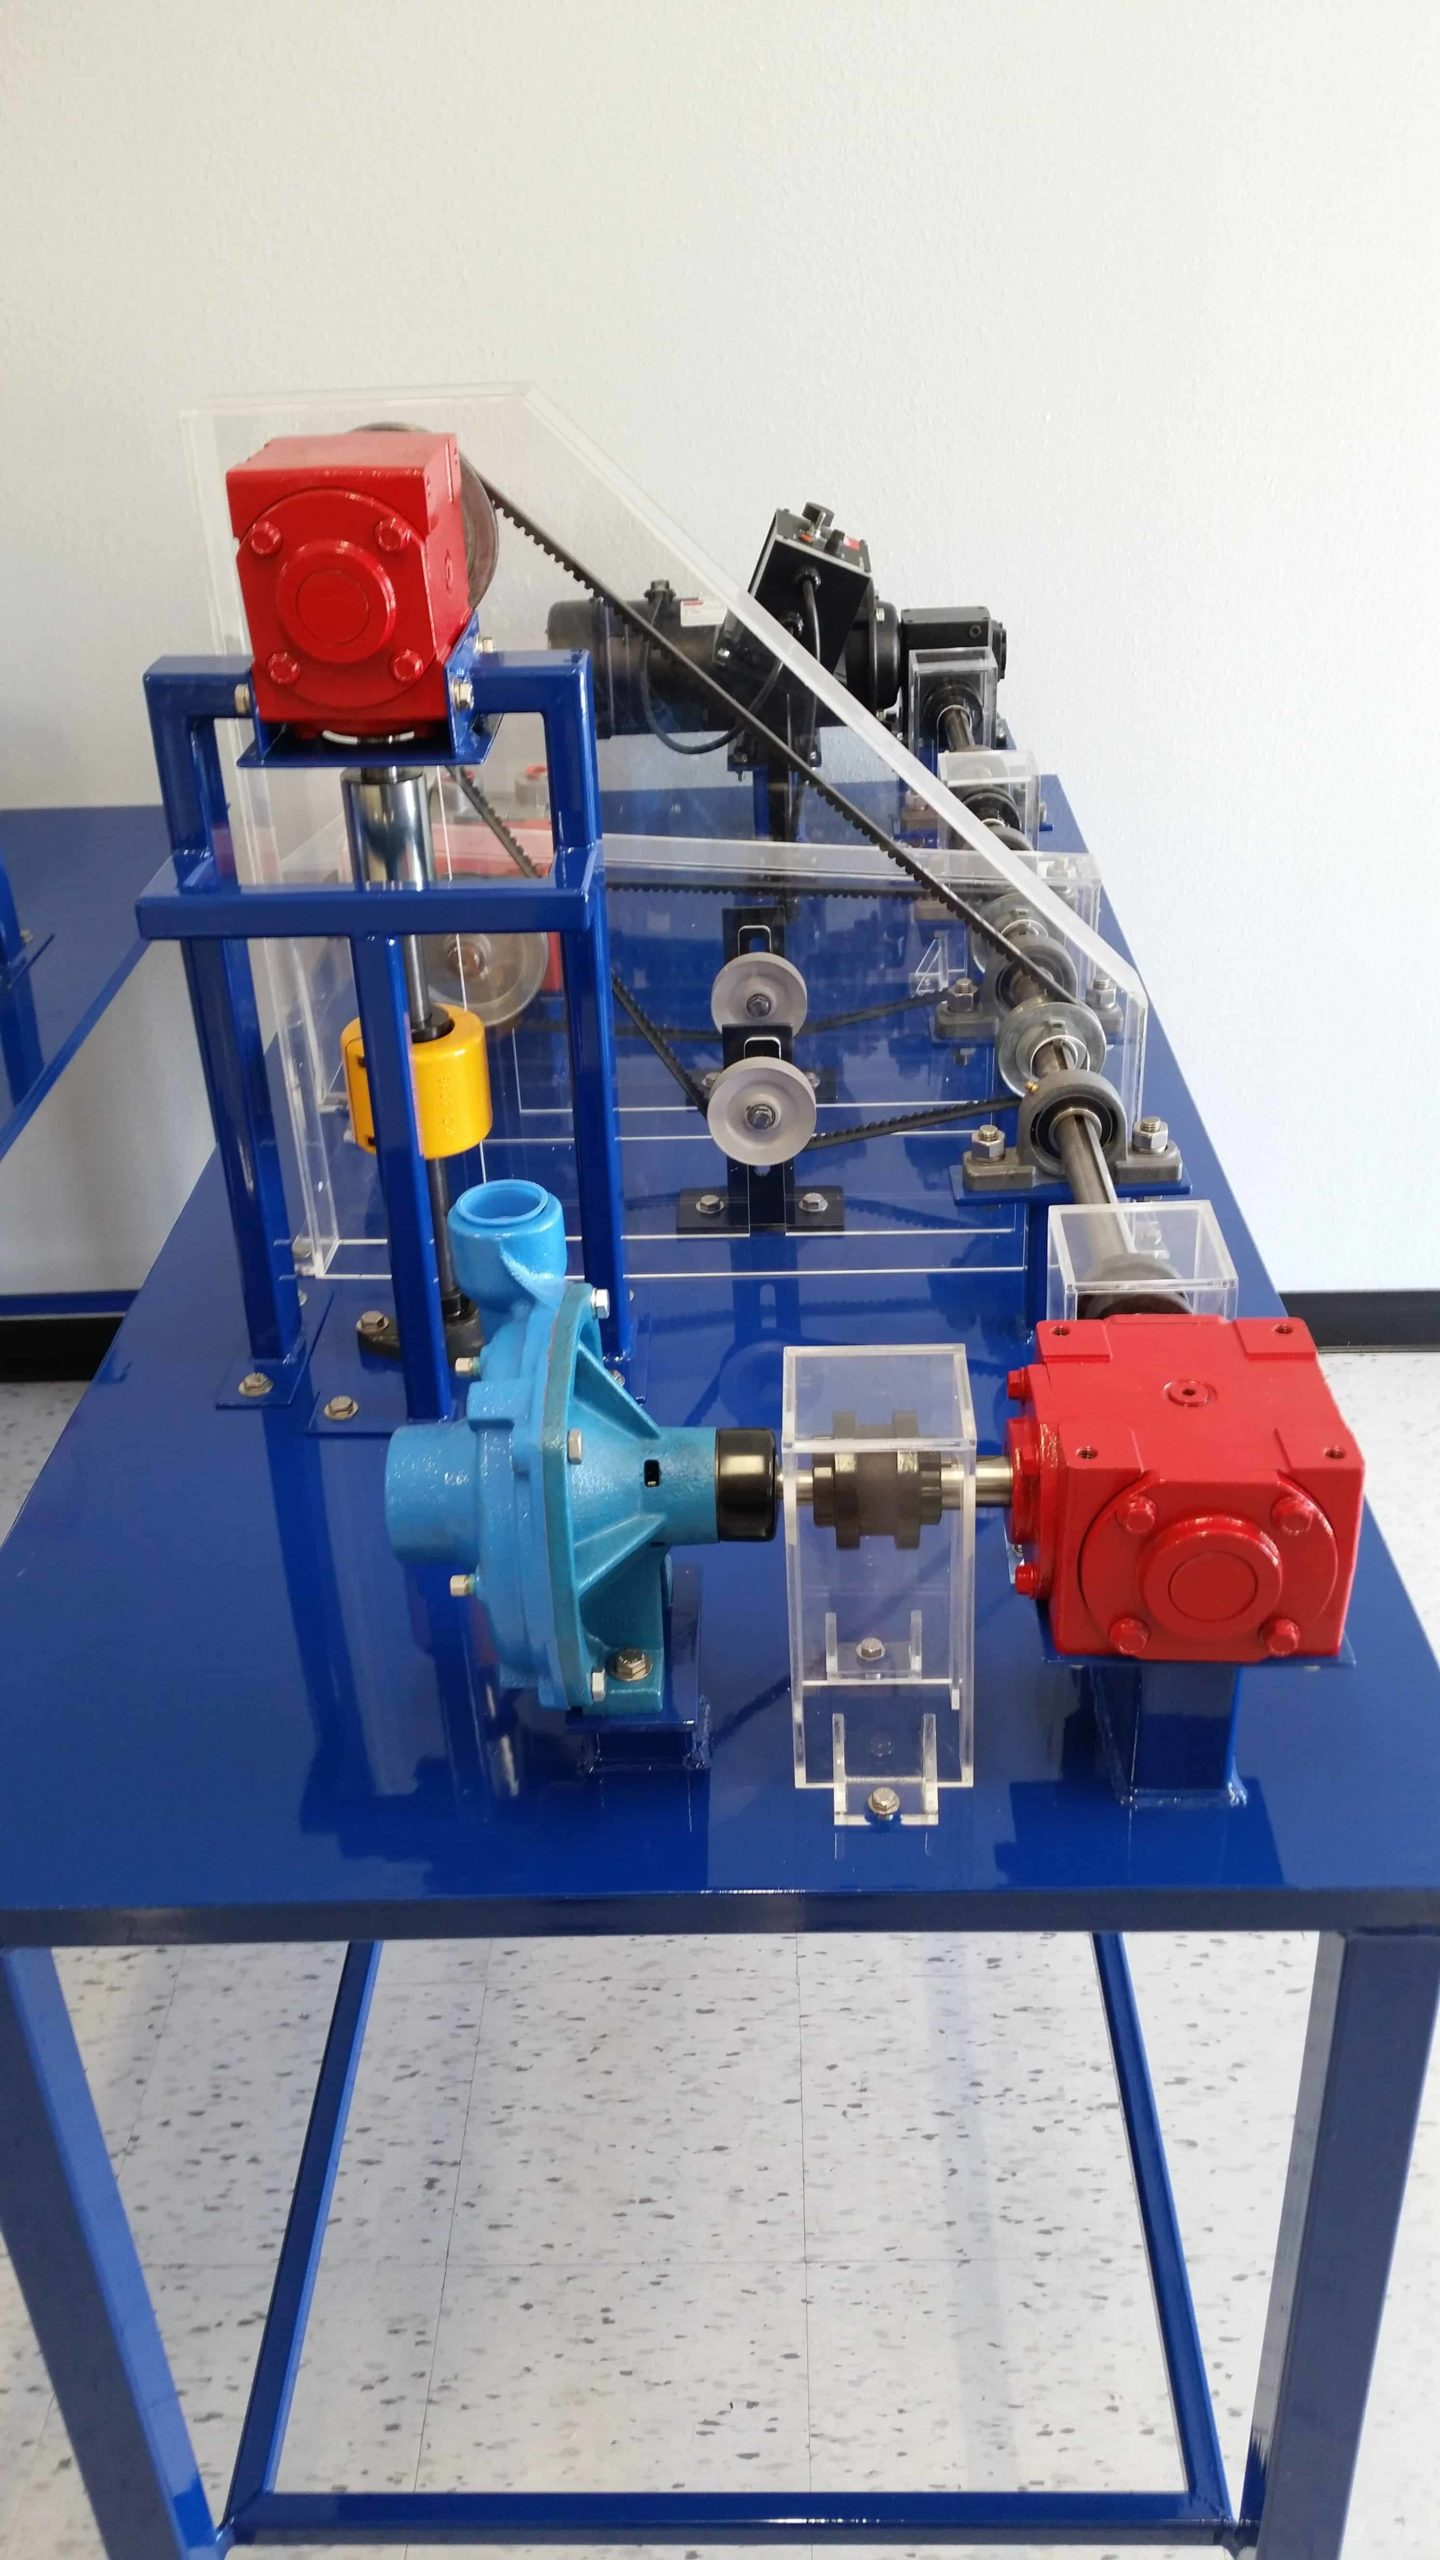 Bayport Technical | Standard Multiple Mechanical Training System (150-SMMT)